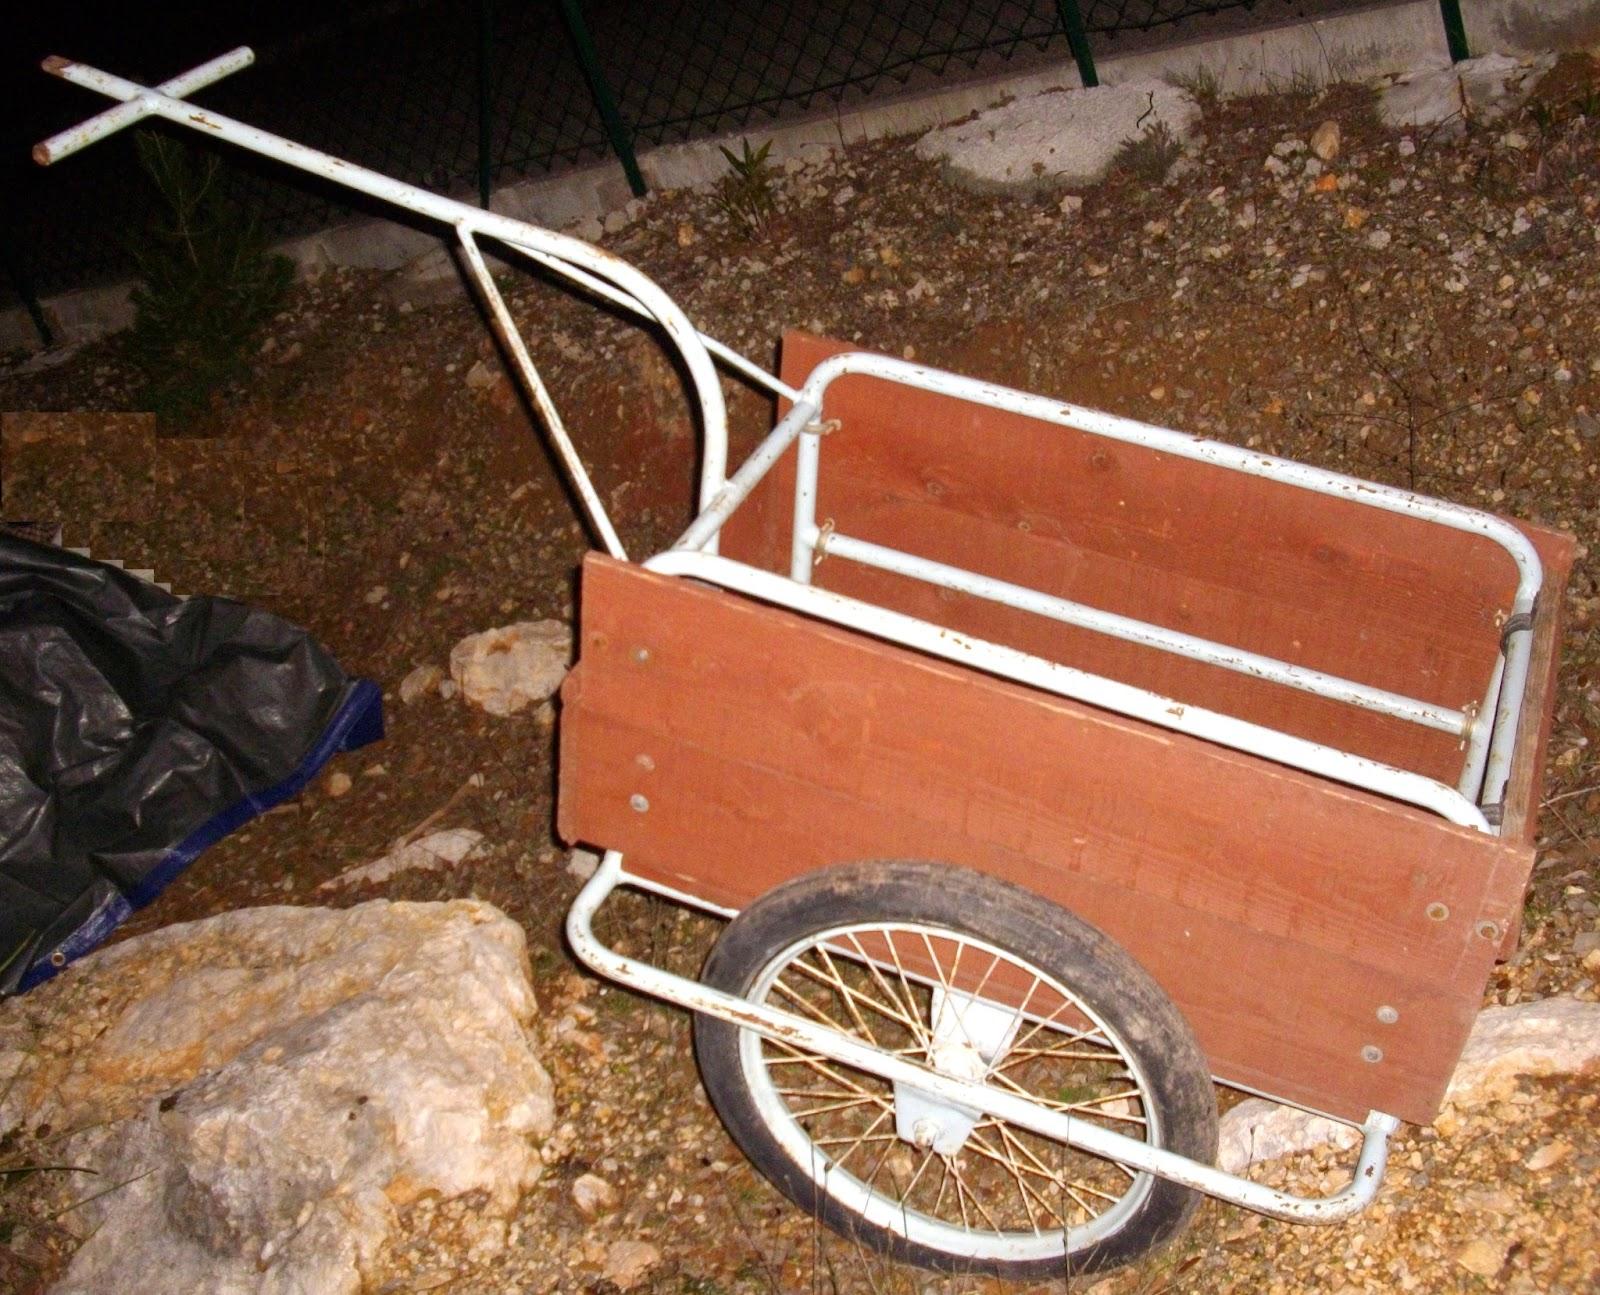 ancienne carriole a v lo remorque cyclo solex charrette fer forg bois jardin art populaire i. Black Bedroom Furniture Sets. Home Design Ideas